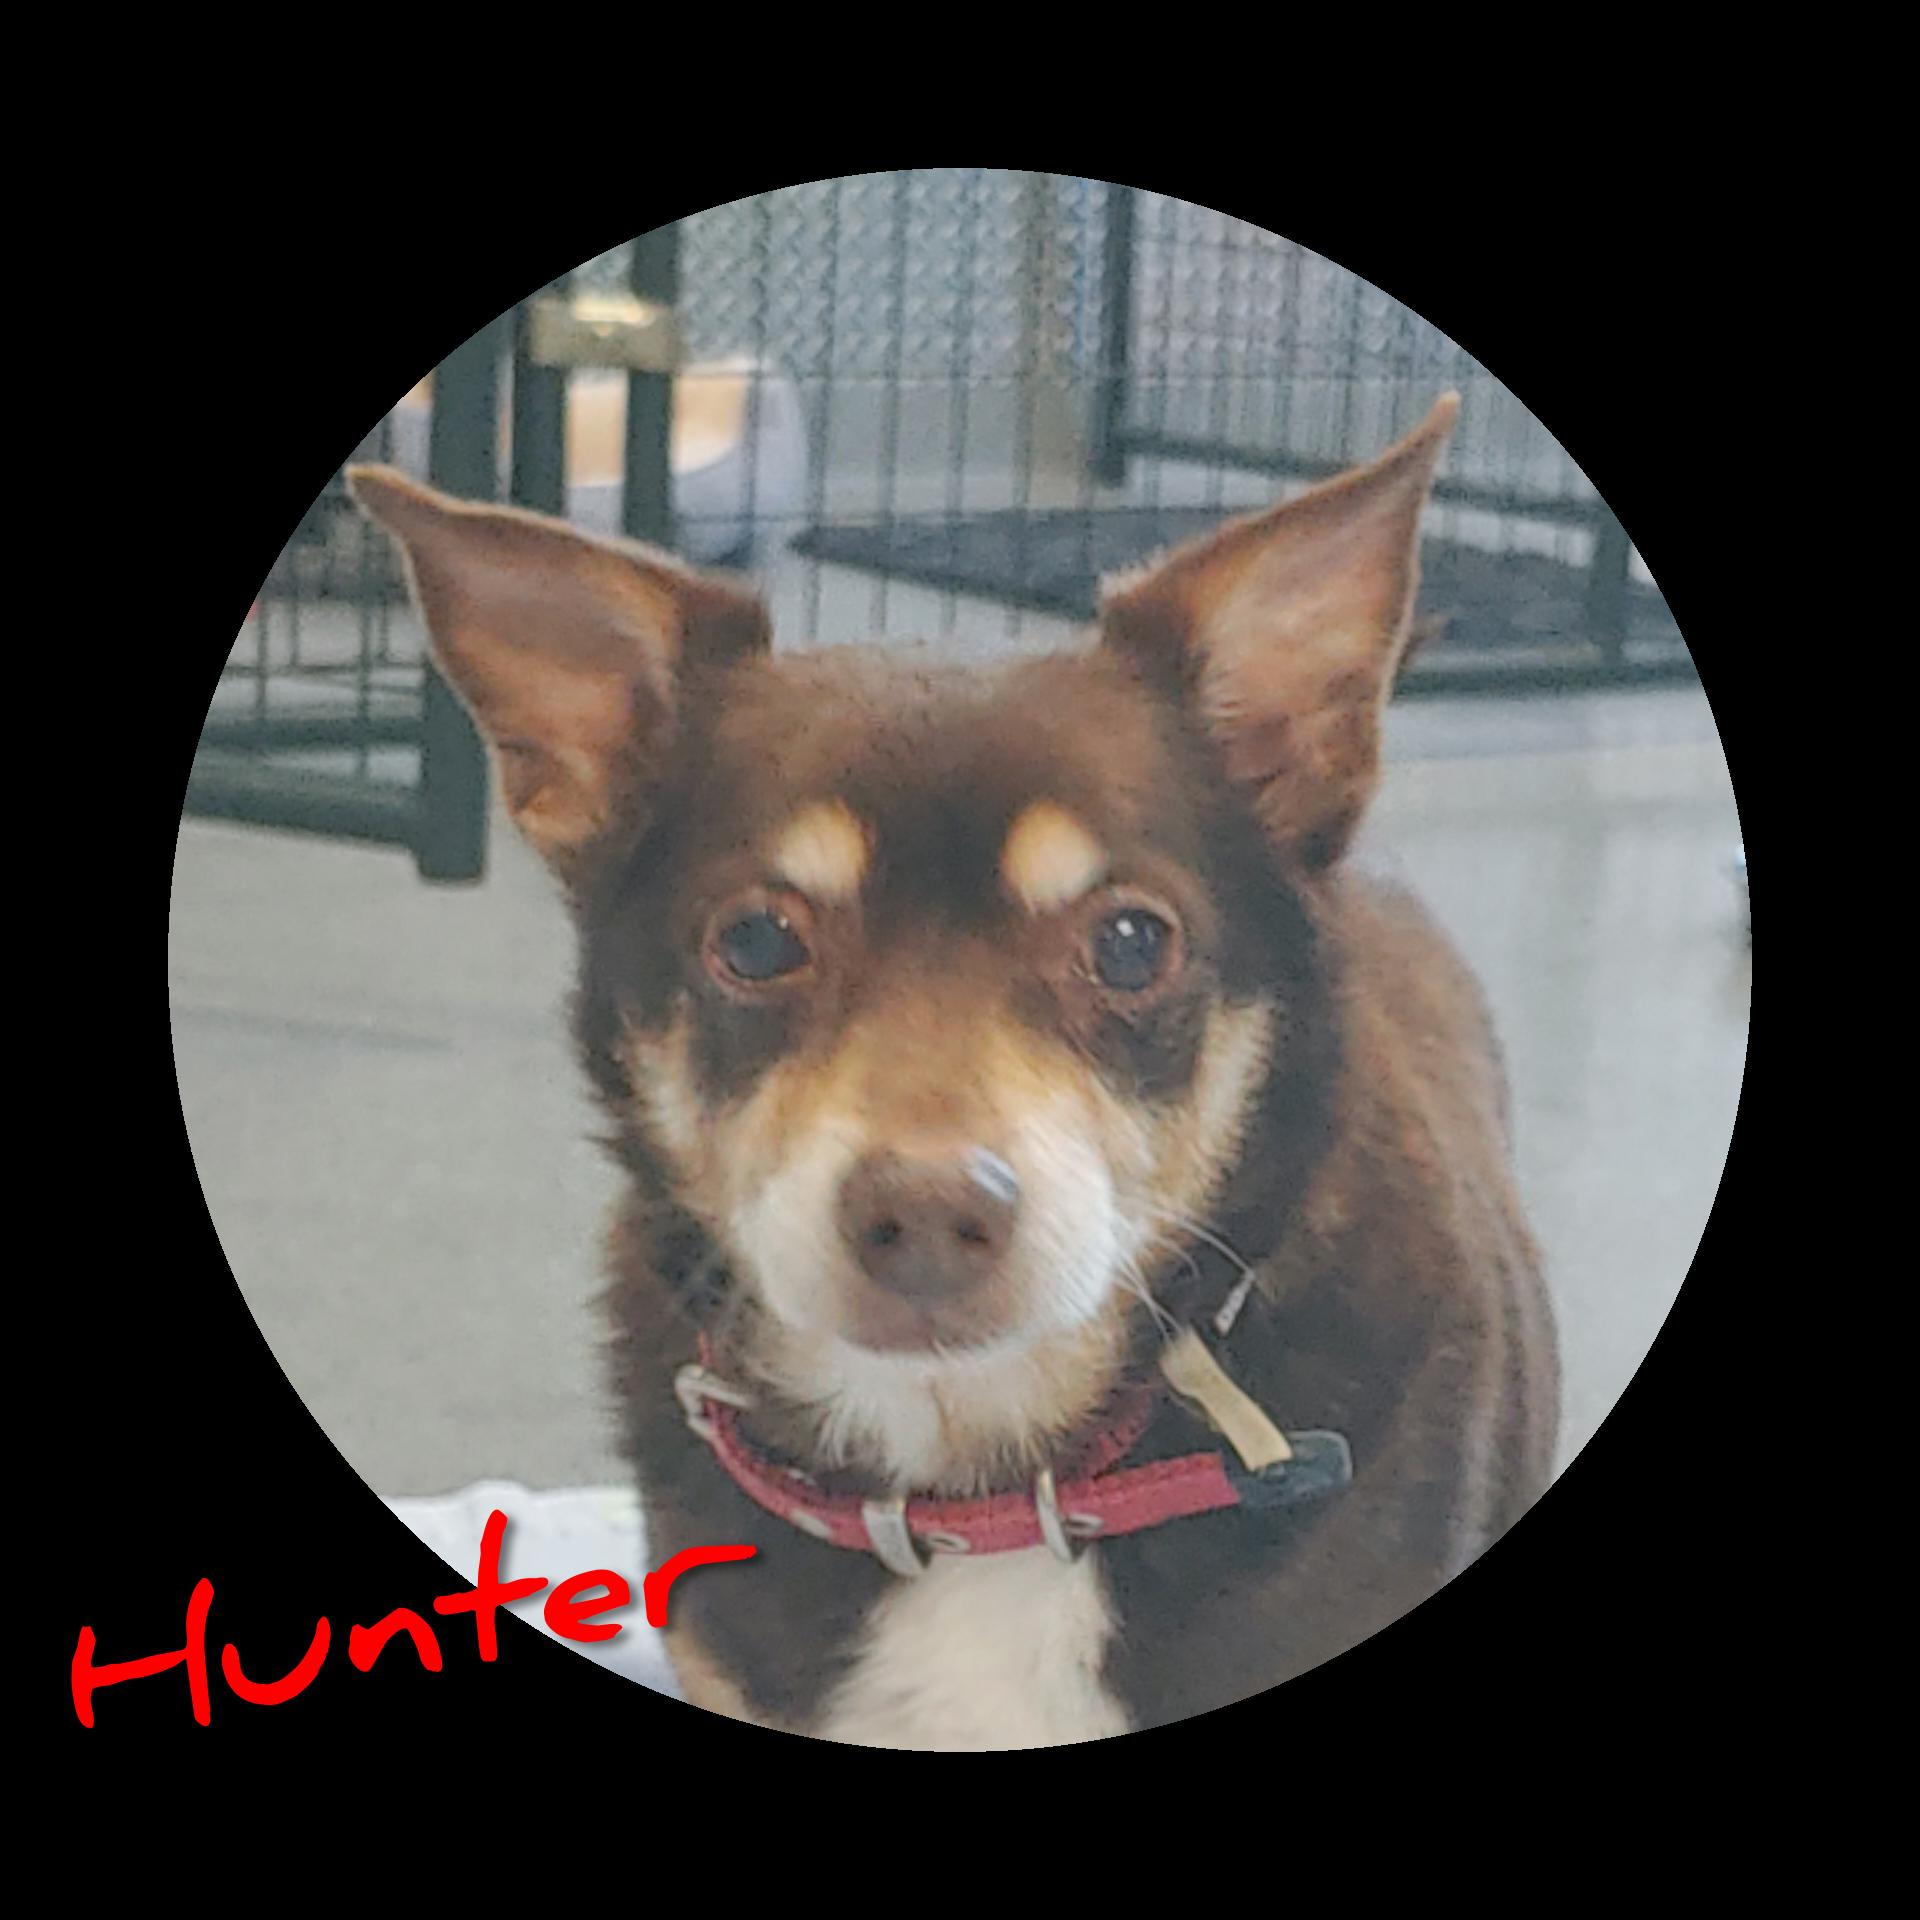 Hunter detail page